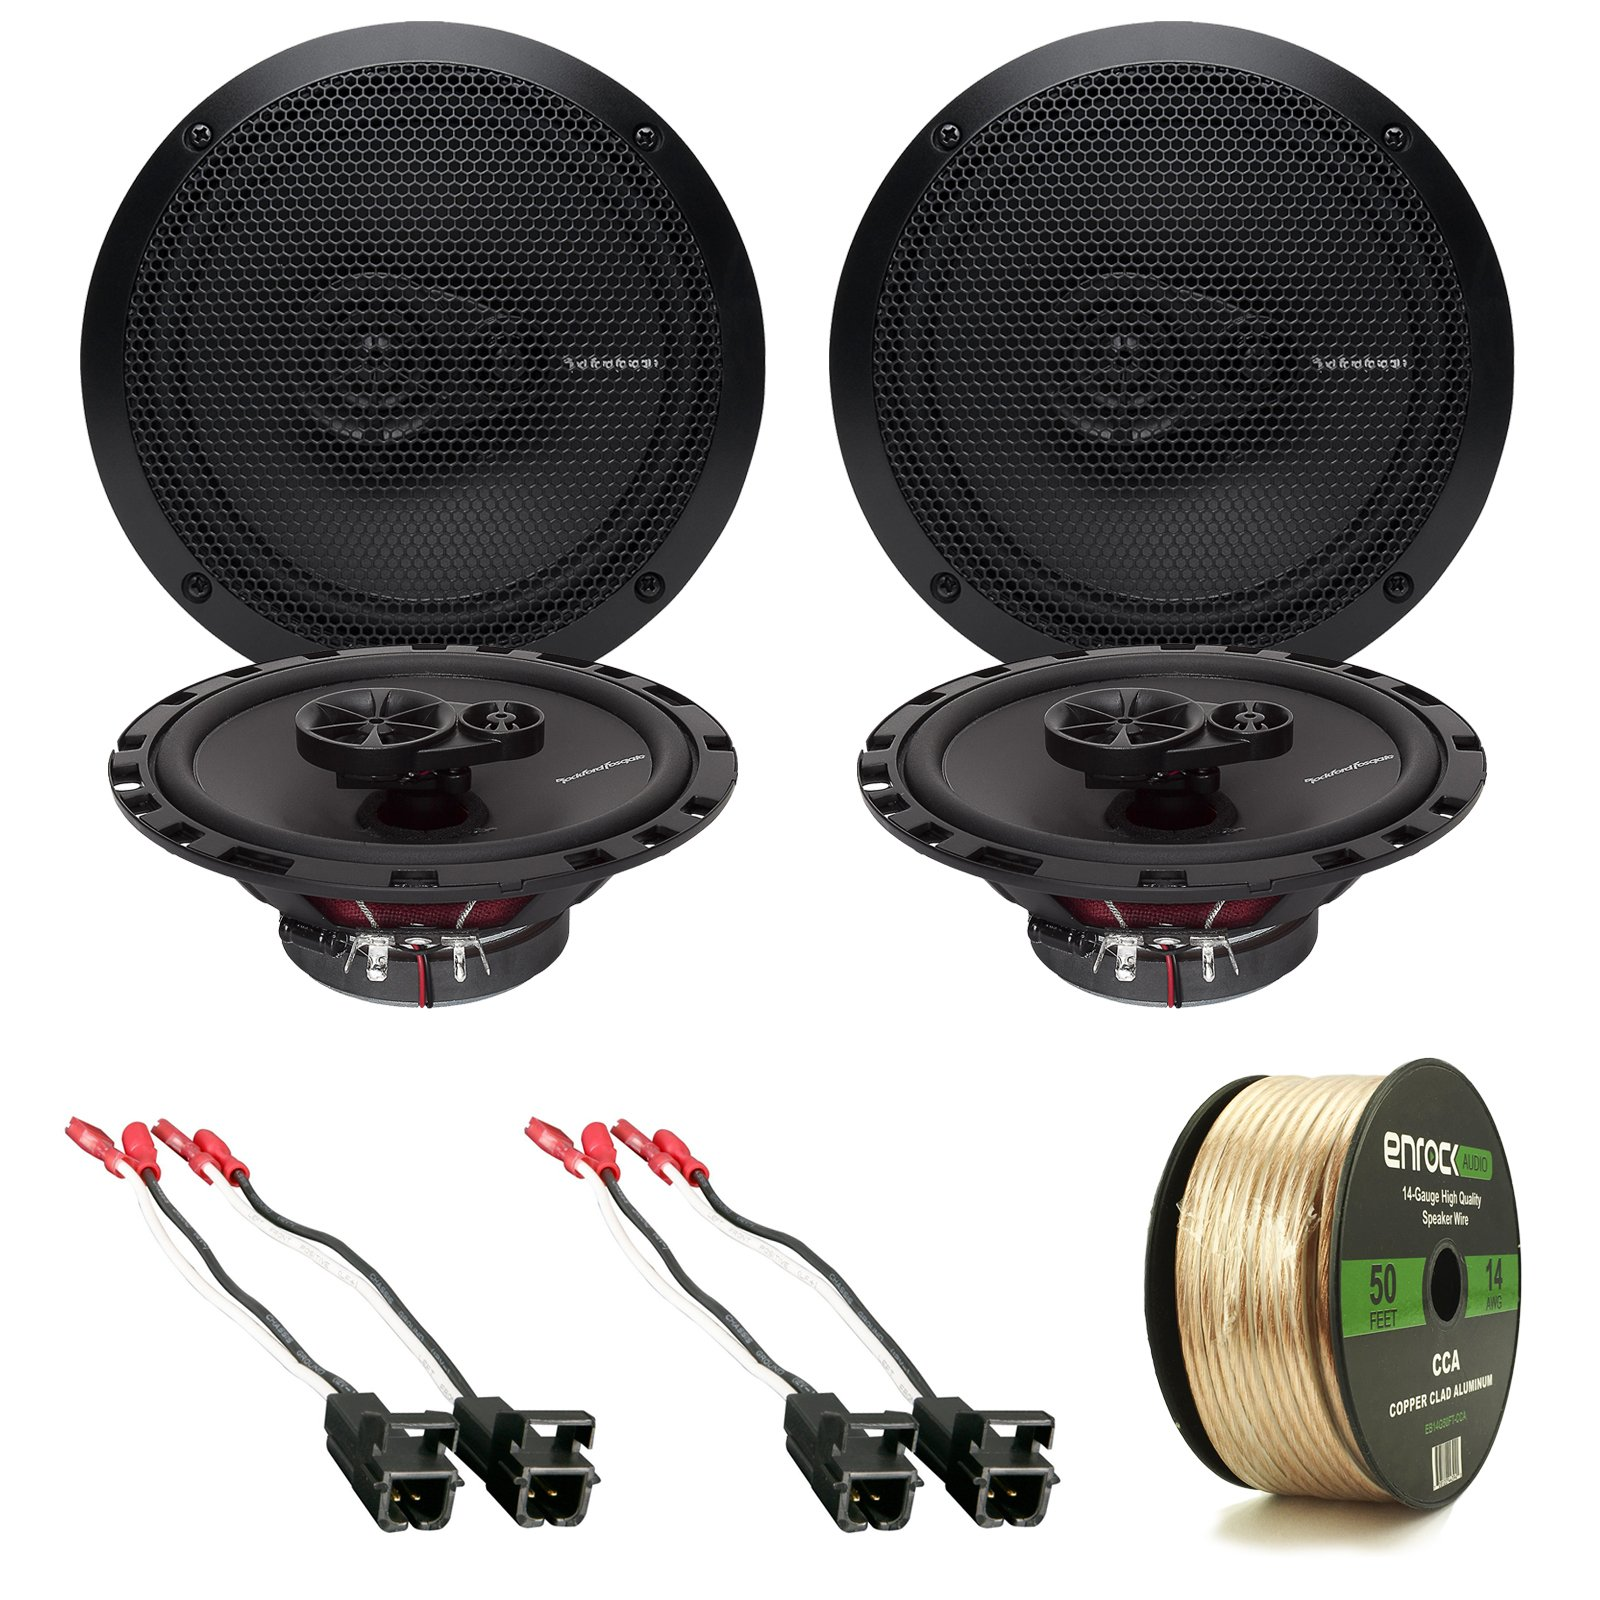 4x Rockford Fosgate R165X3 Prime 6.5'' Inch 180 Watt 3-Way Full-Range Black Car Coaxial Audio Speaker Bundle Combo With 4x Speaker Harness for Select 1984-2013 GM Vehicles + 50 Ft 16-Gauge Speaker Wire